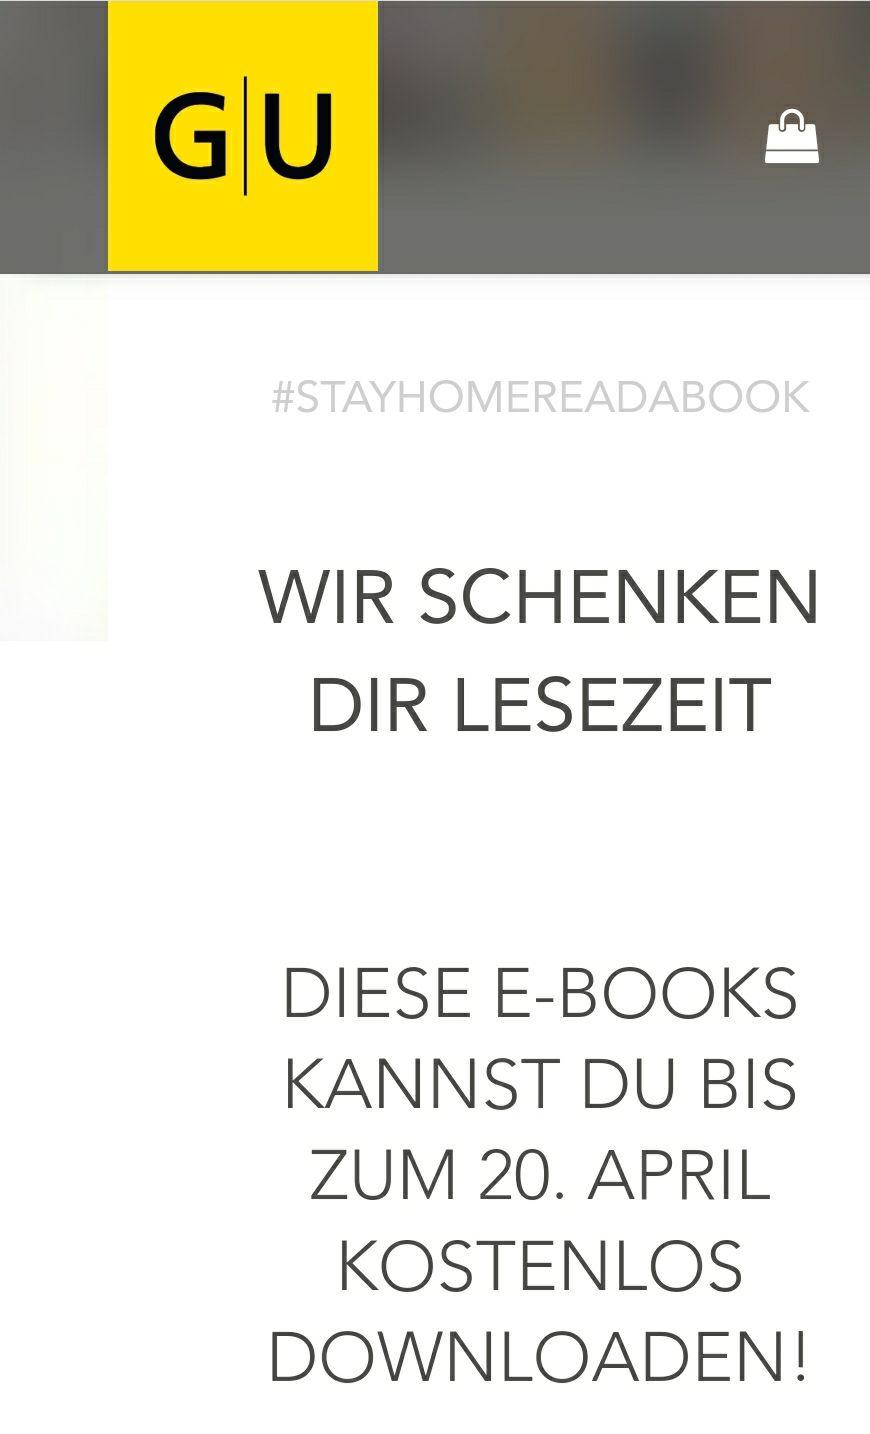 GU kostenlos Bücher downloaden(z.B. Lafers Kochbuch)